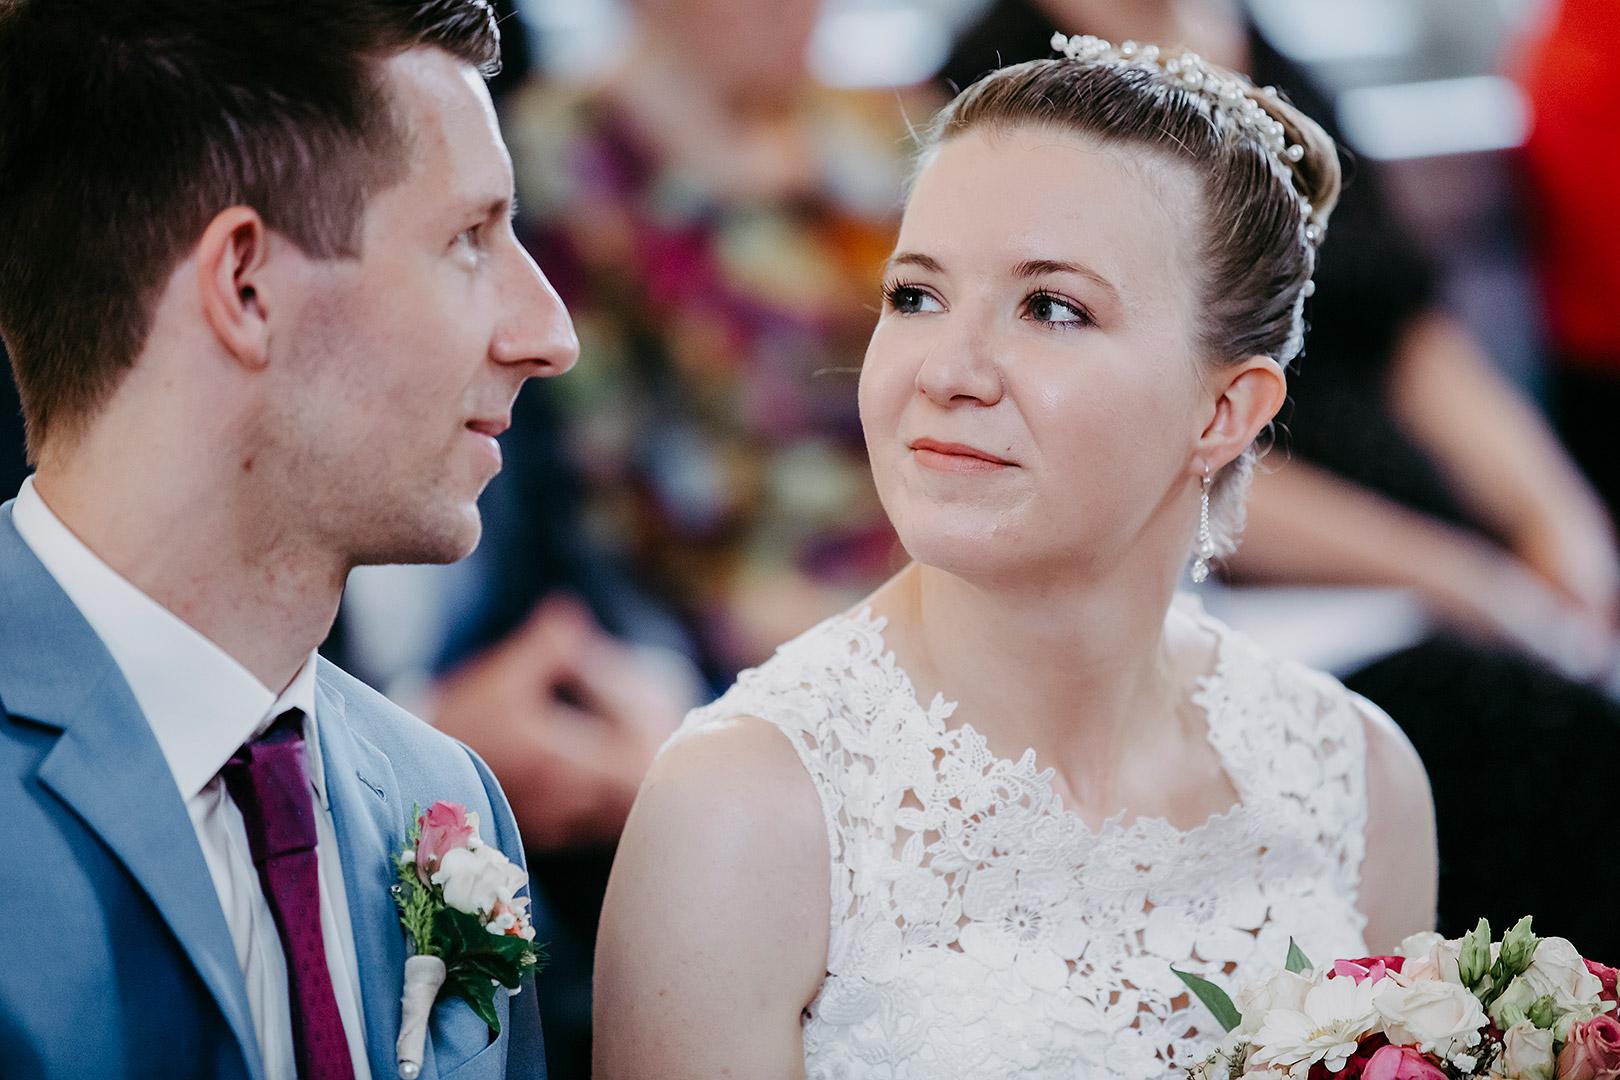 portrait_wedding_stefanieundsven_14